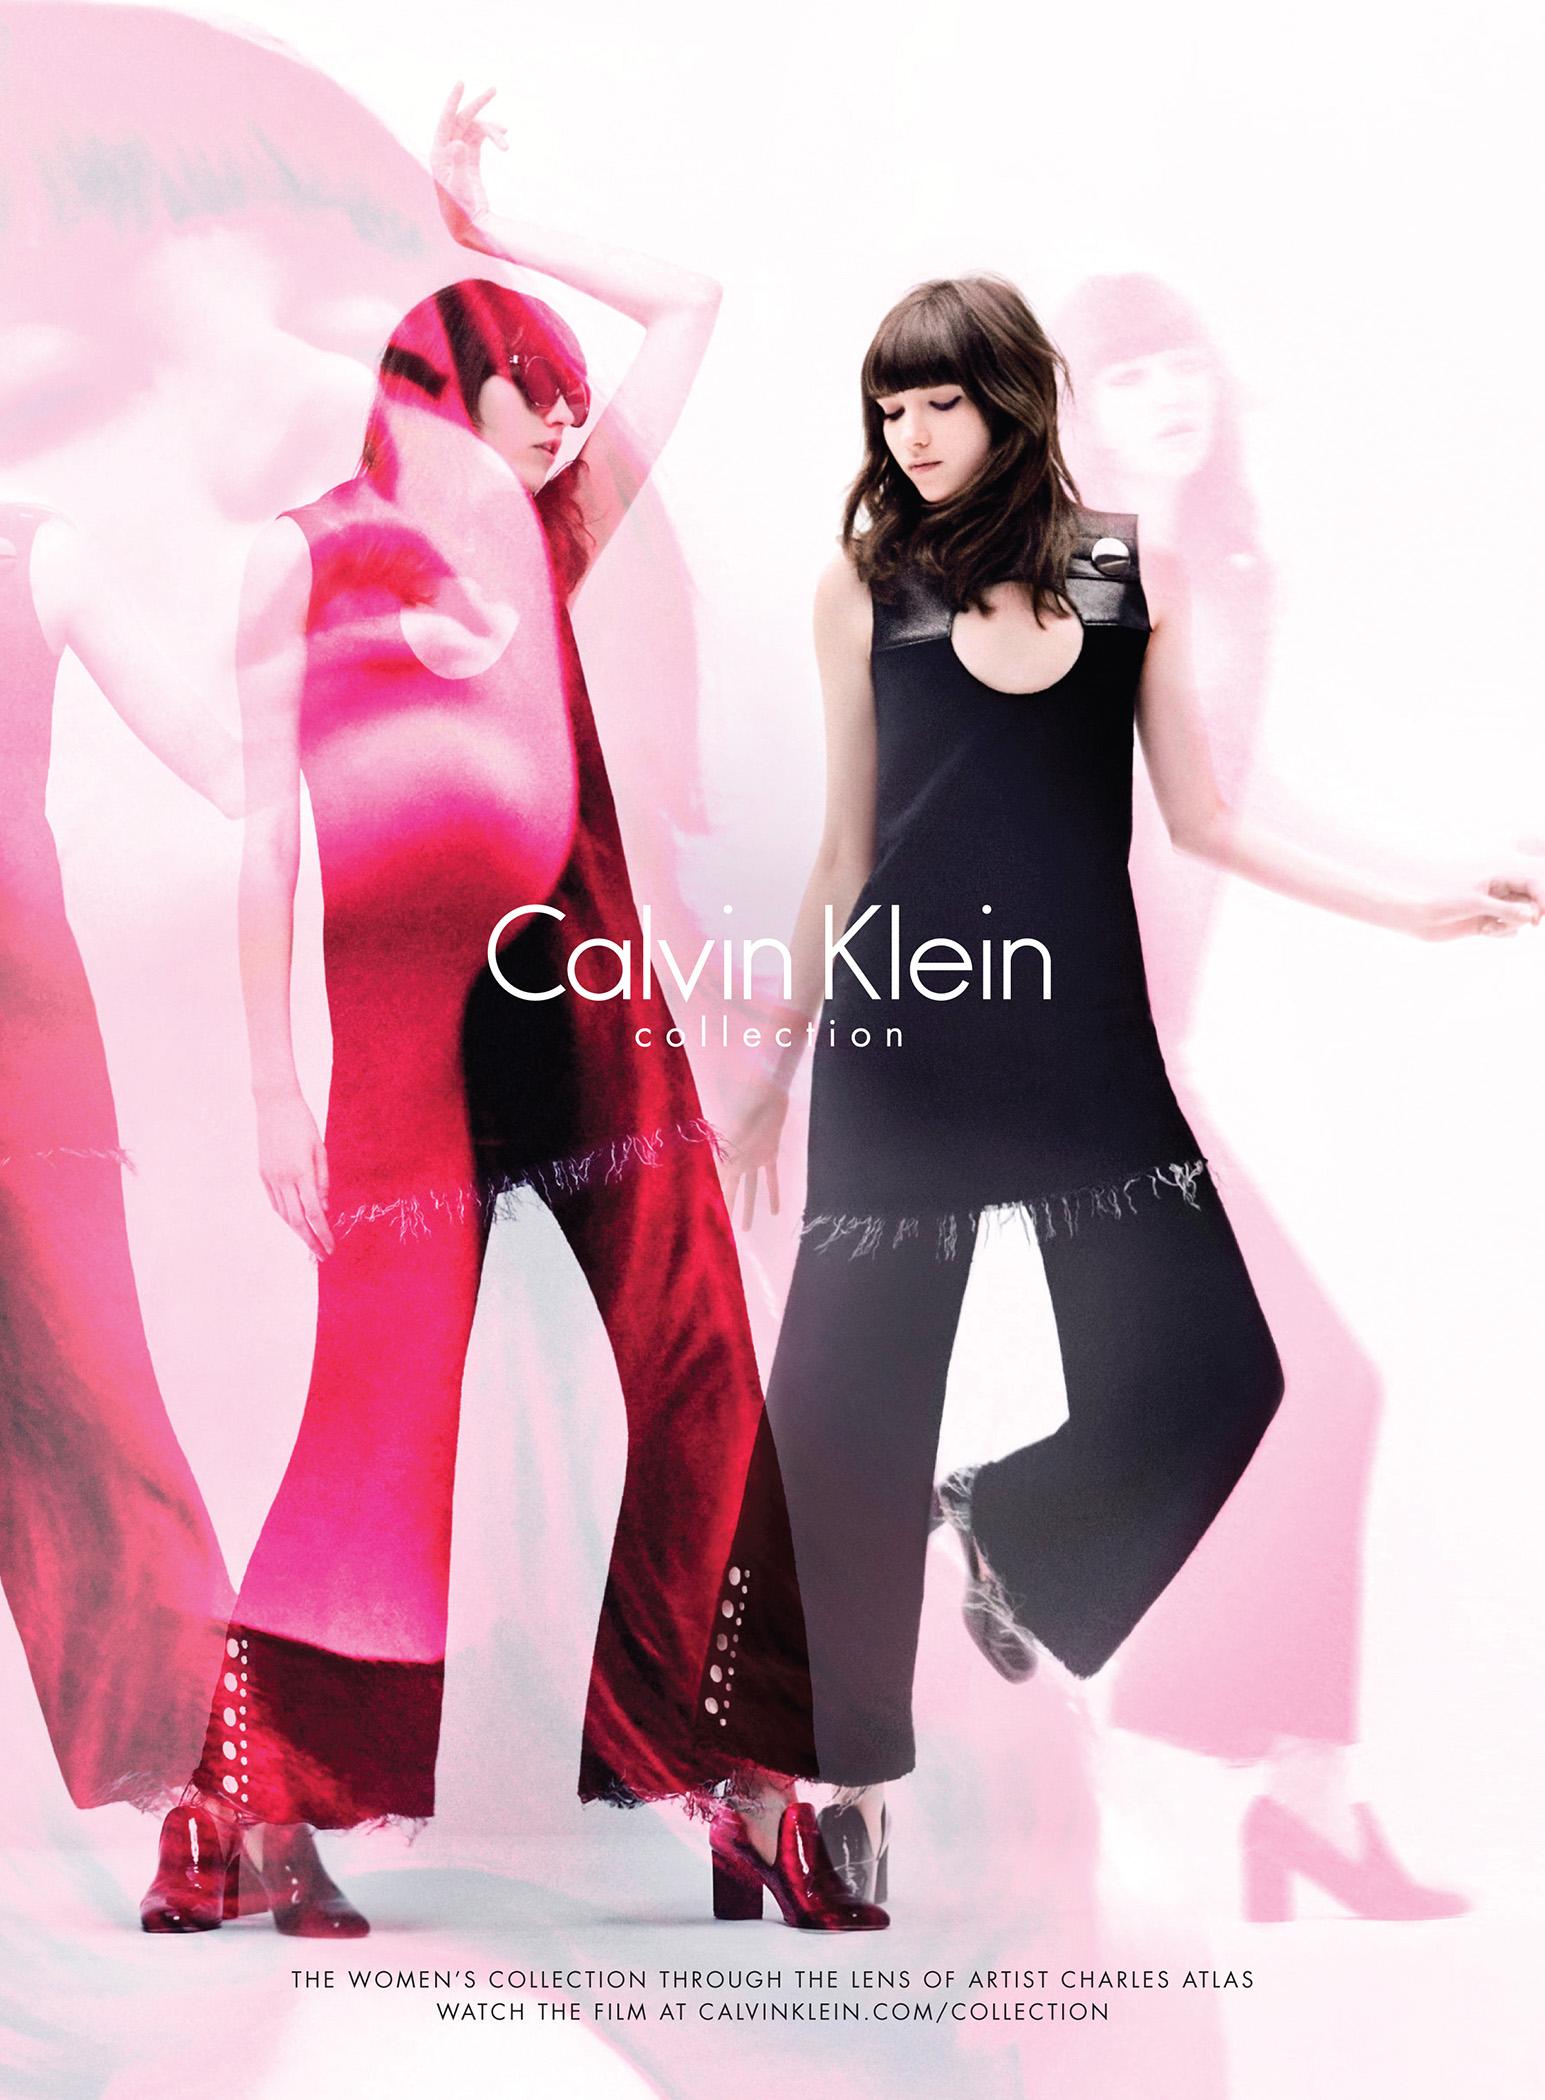 Calvin Klein Global Marketing Campaign x Charles Atlas